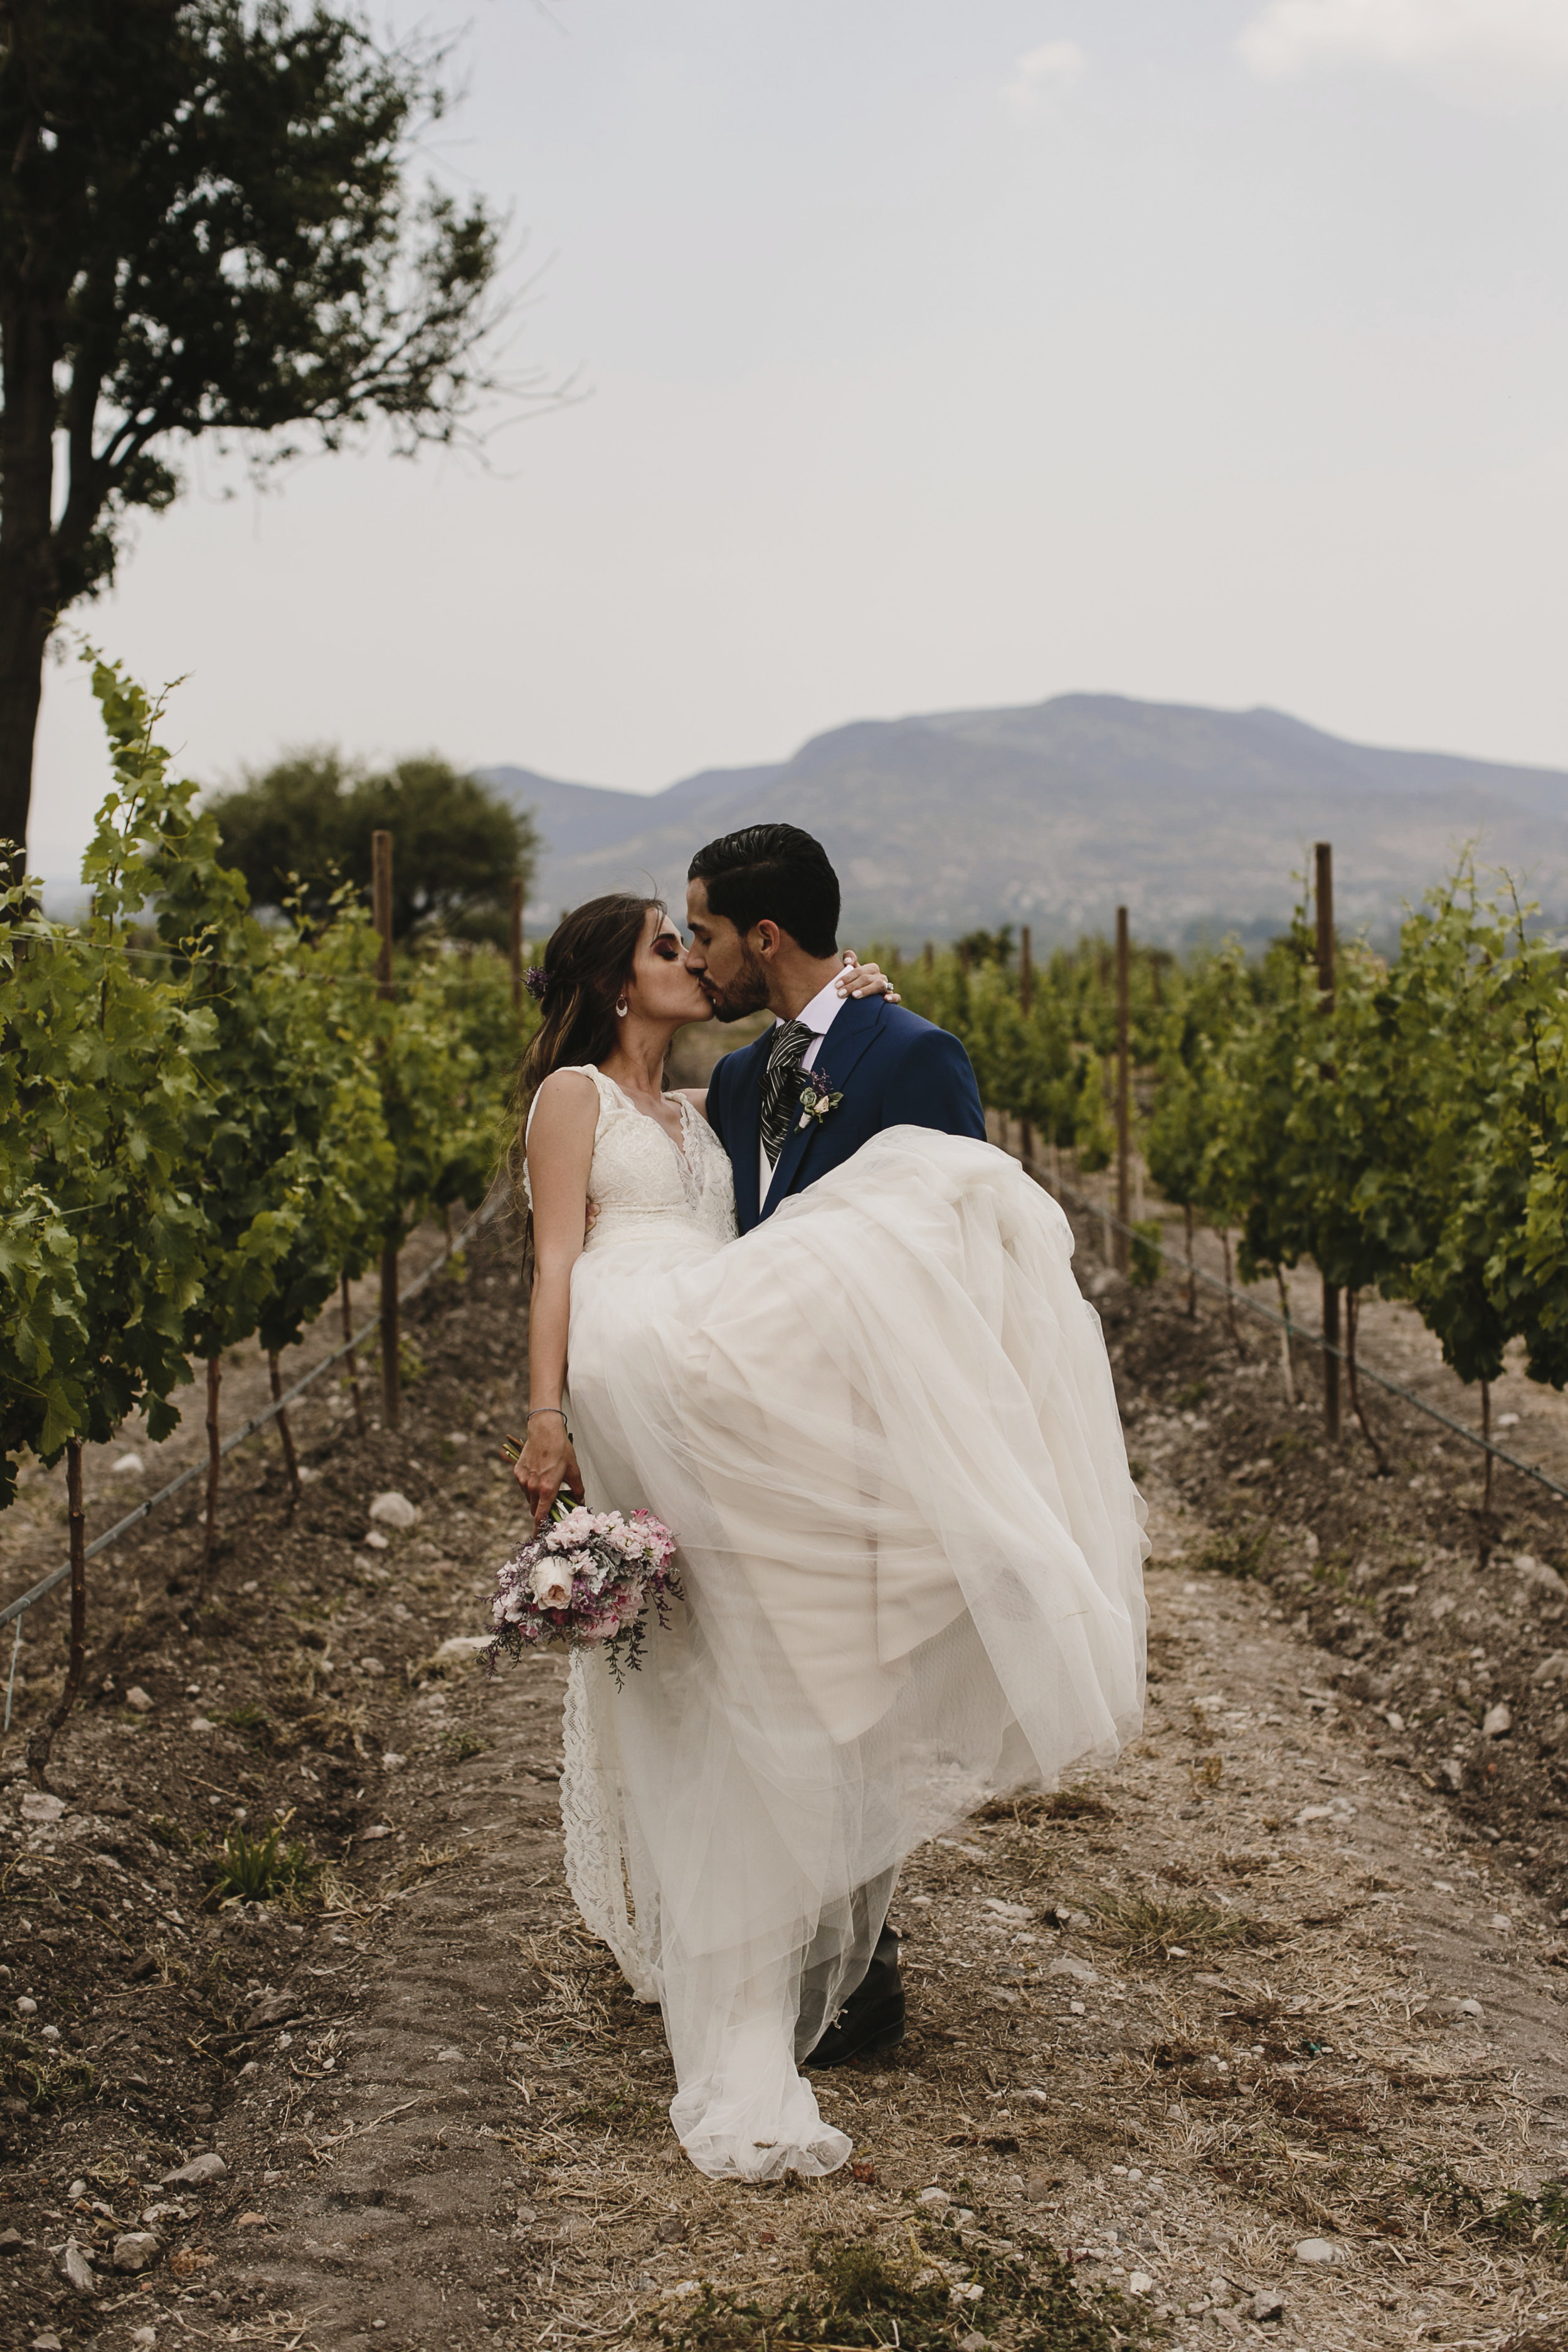 alfons_flores_destination_wedding_photography_mavi_david-1265.JPG